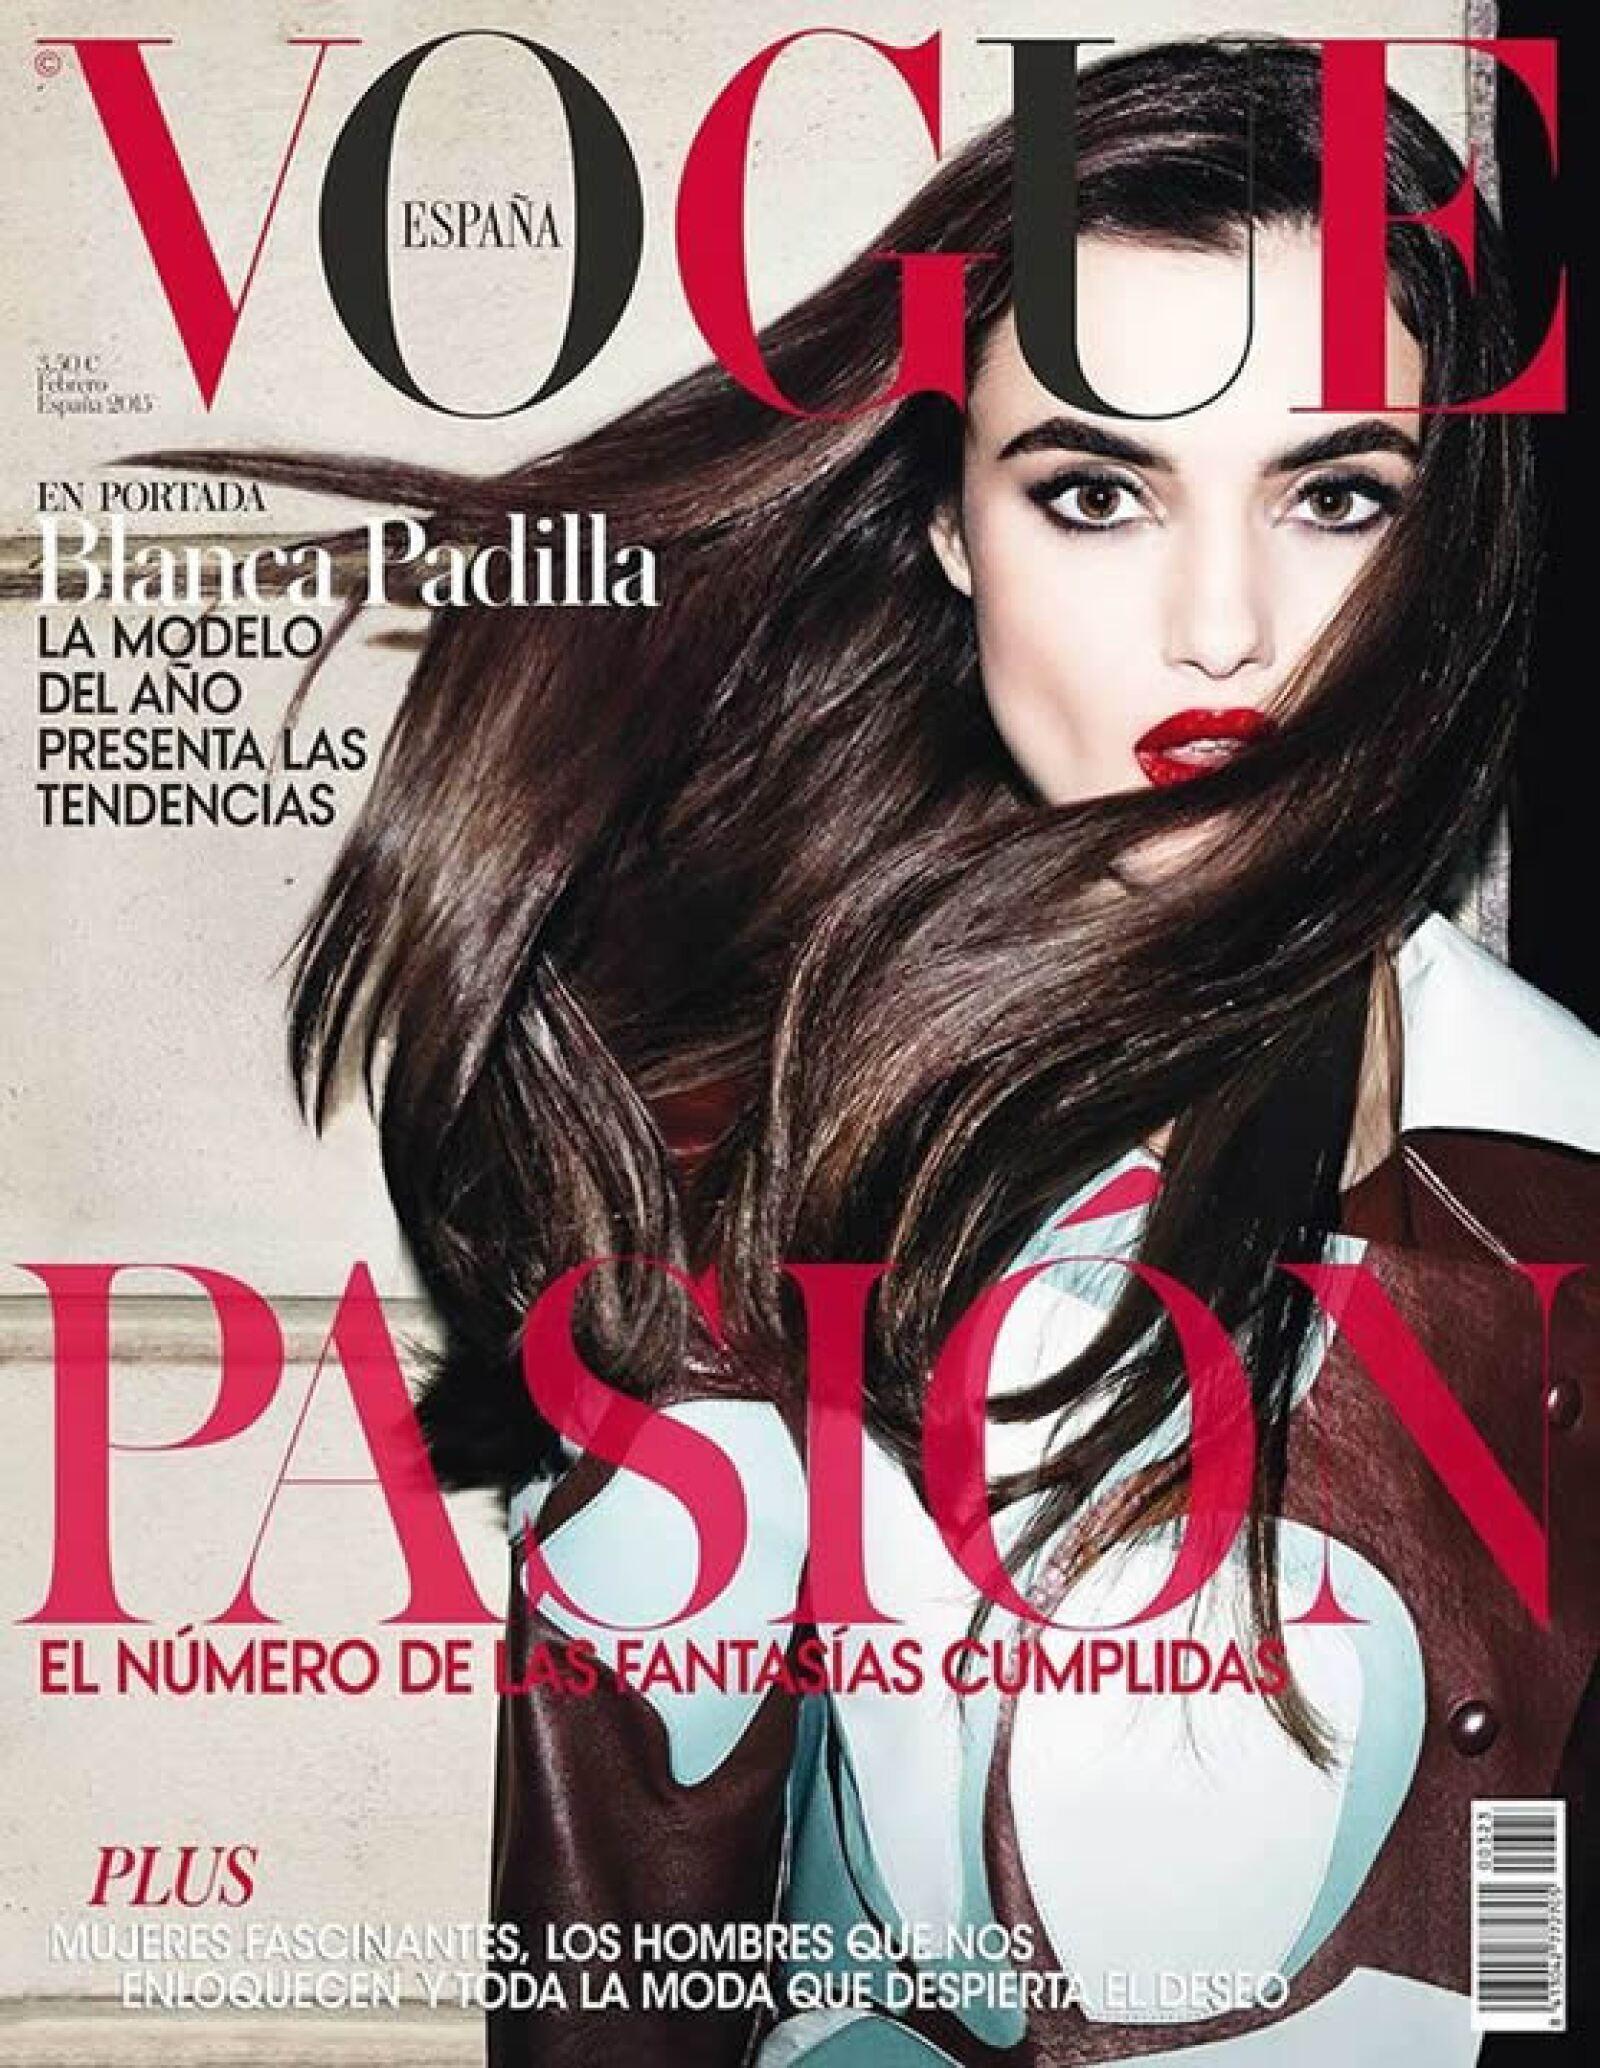 El fotógrafo Matt Erwin retrata a Blanca Padilla para la portada de Vogue España.